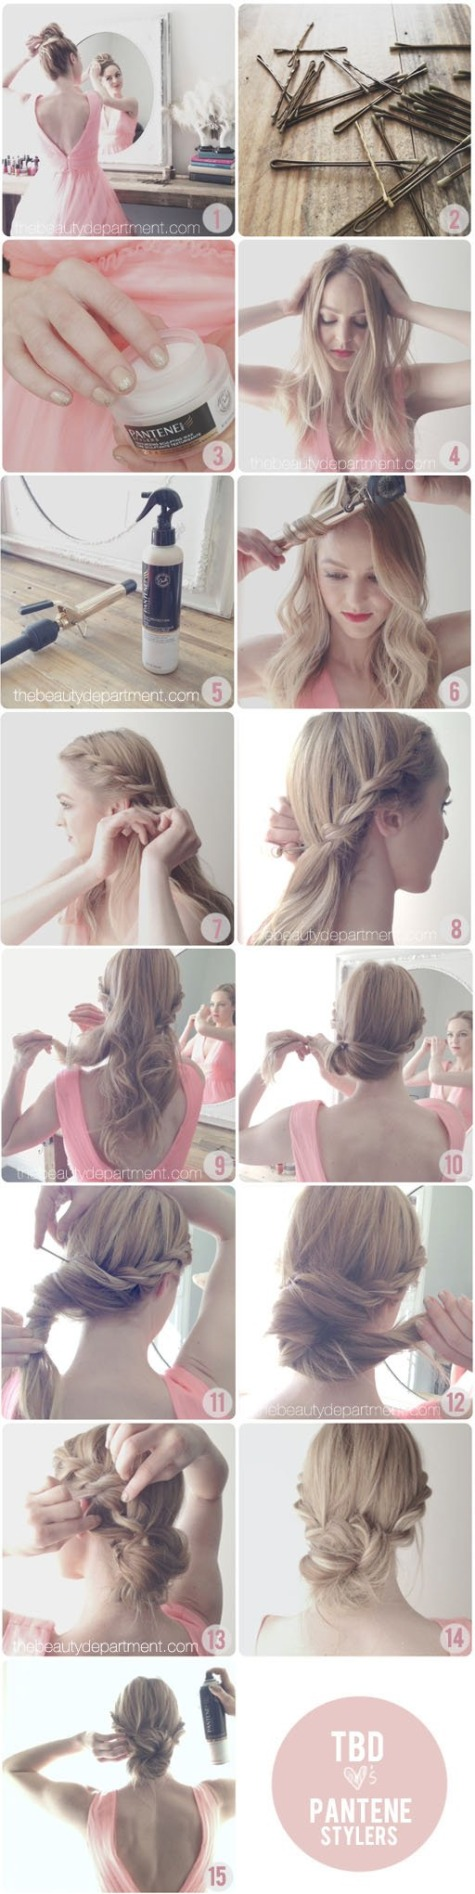 22 Amazing Braid Hairstyle Tutorials